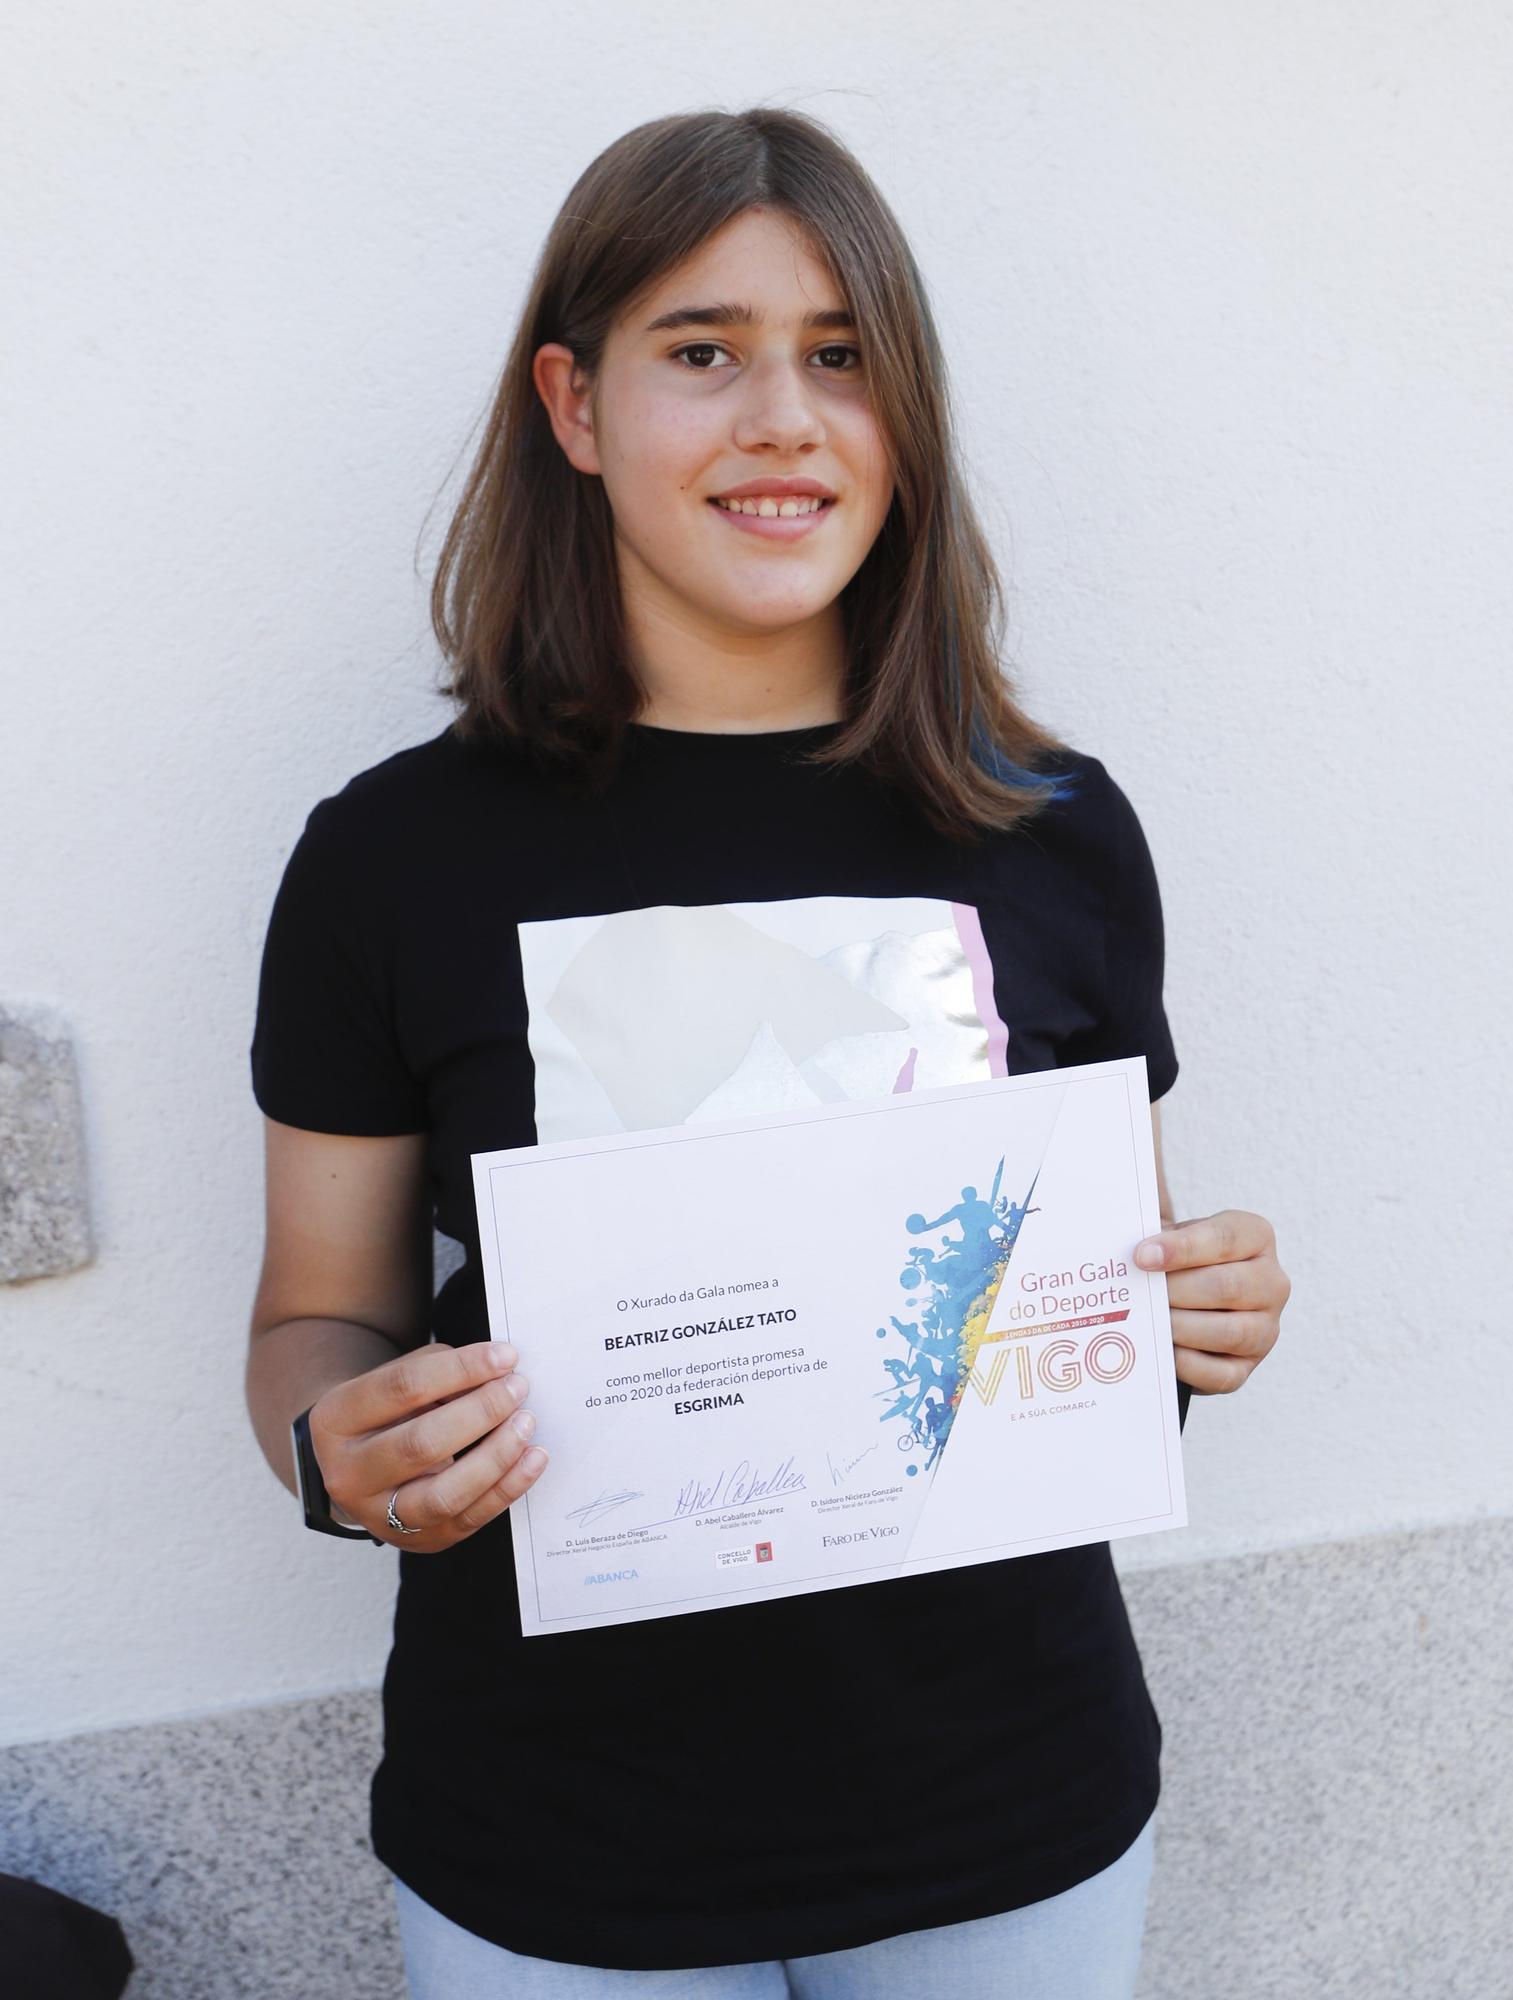 Beatriz González Tato-Esgrima